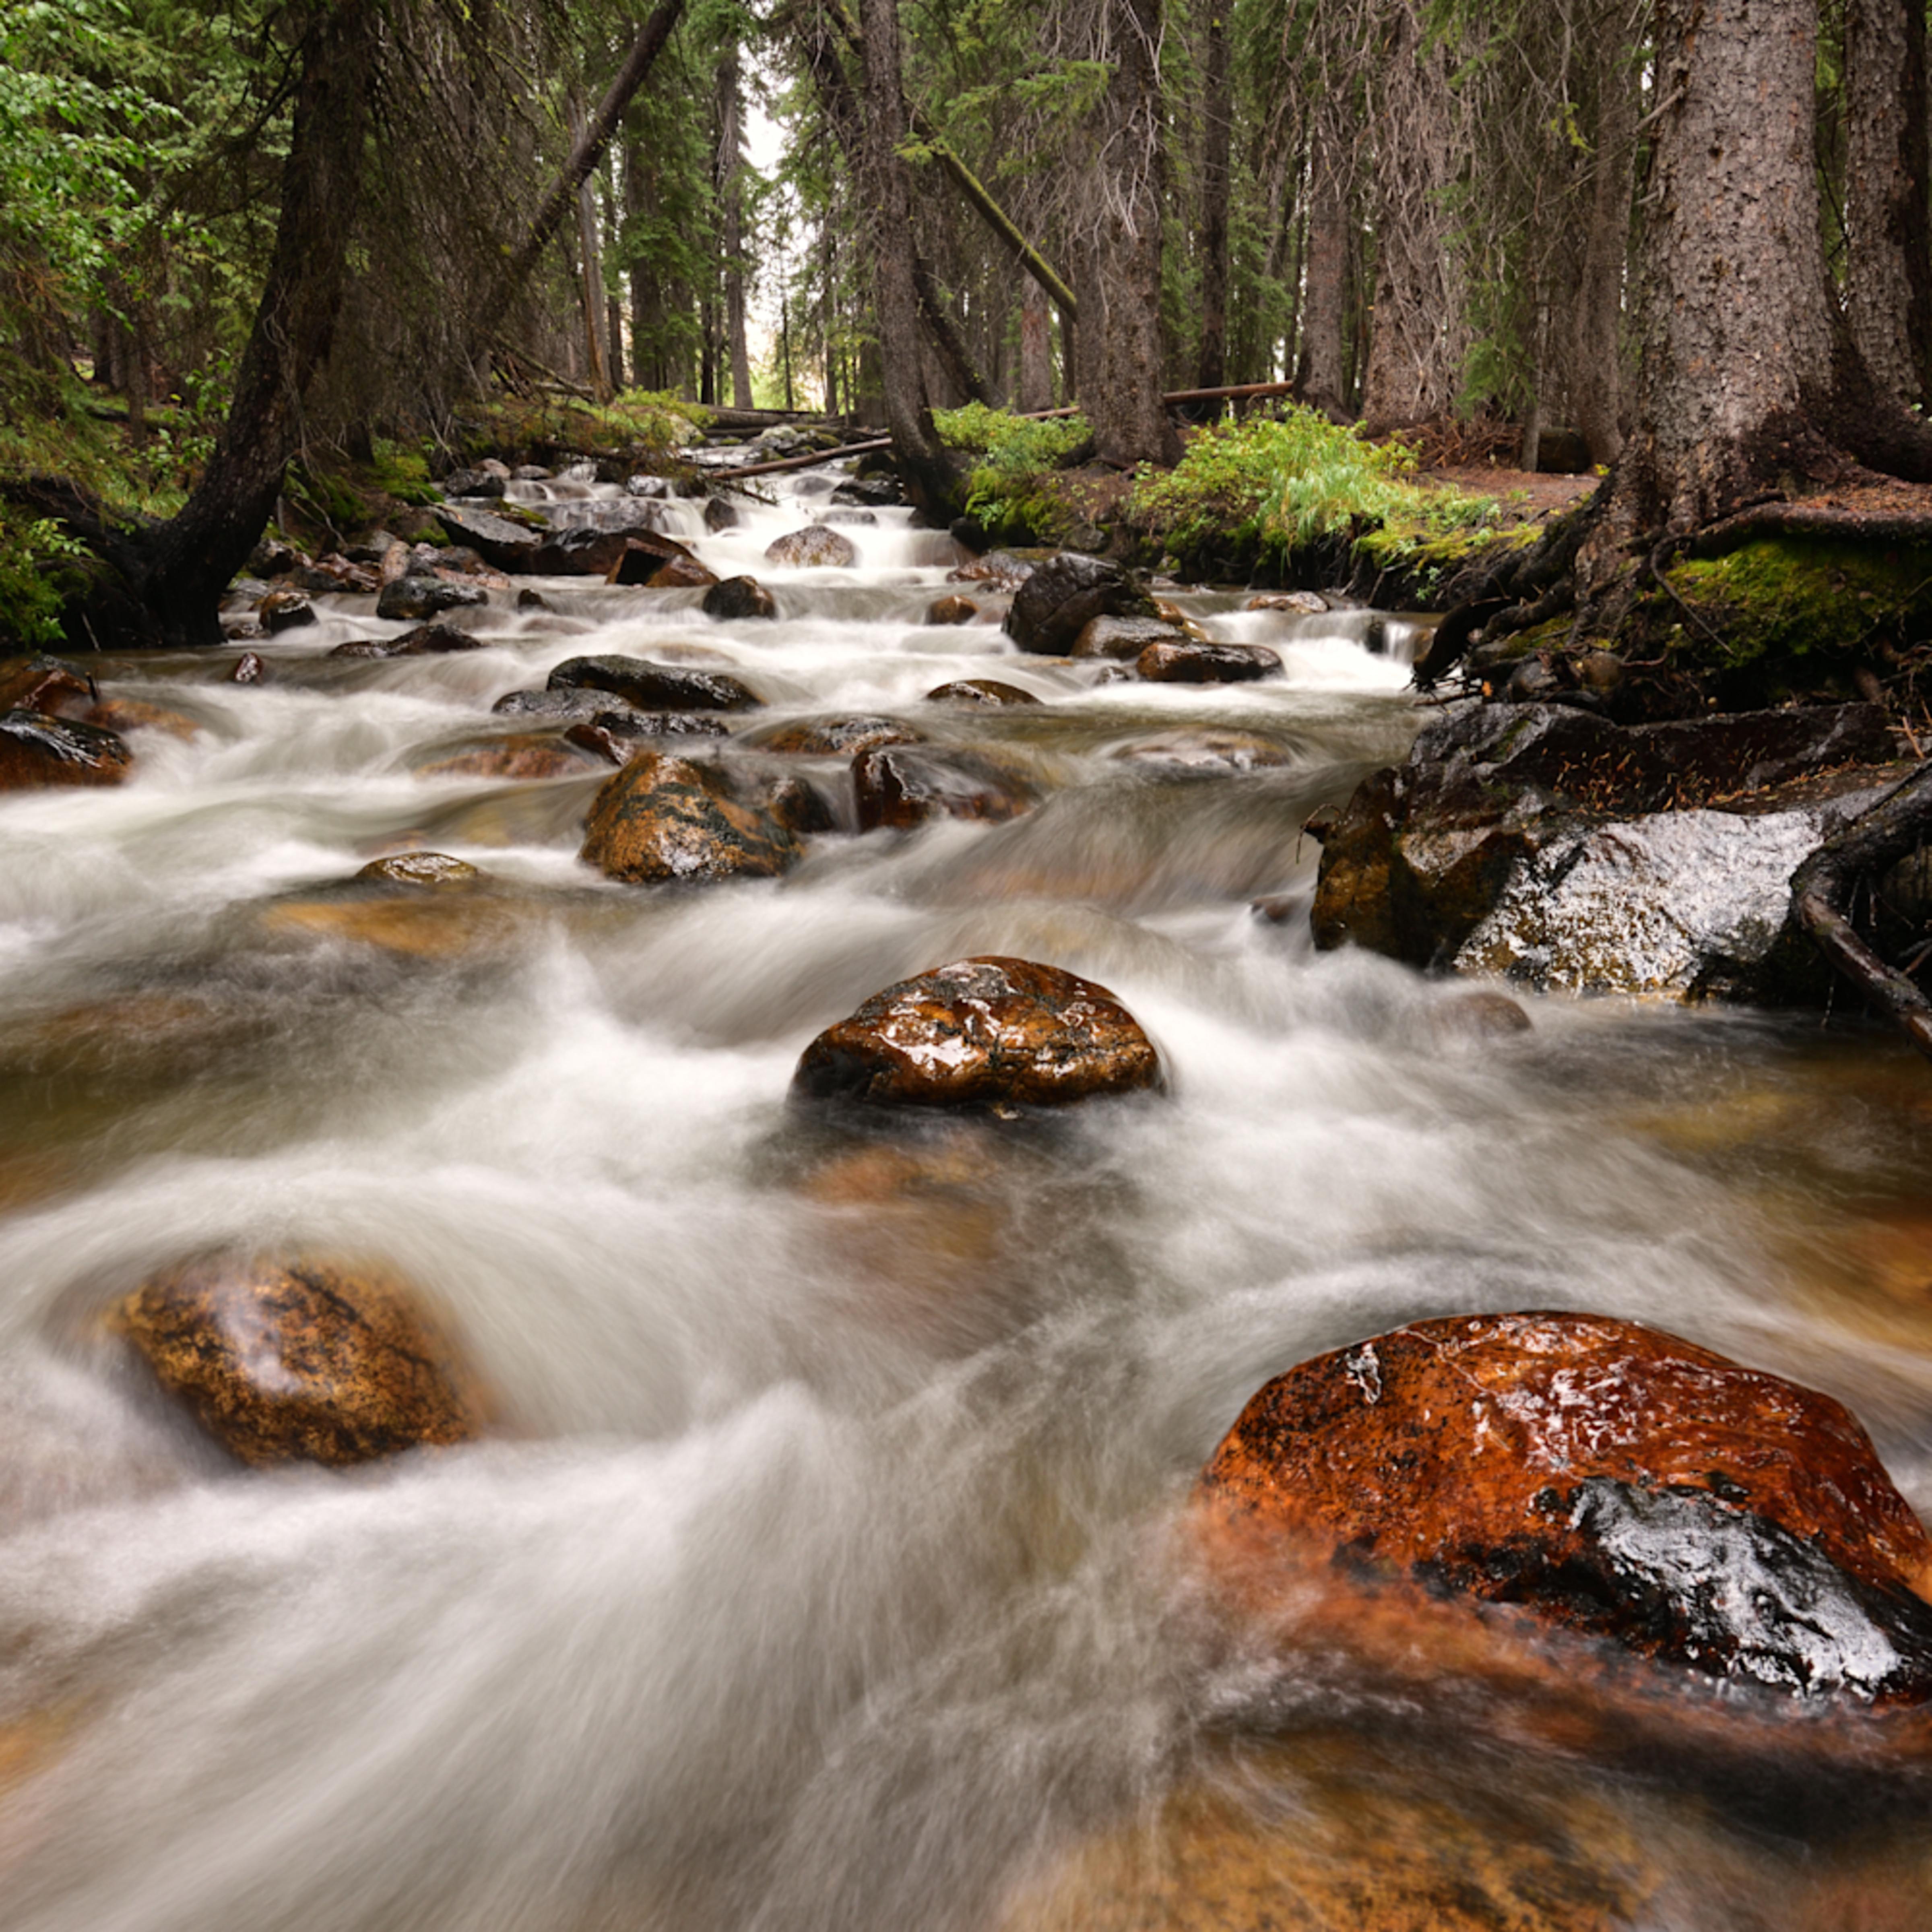 D81 6229 fishhook creek 3 rocks crop.into the woods.hr ns rgfjzq